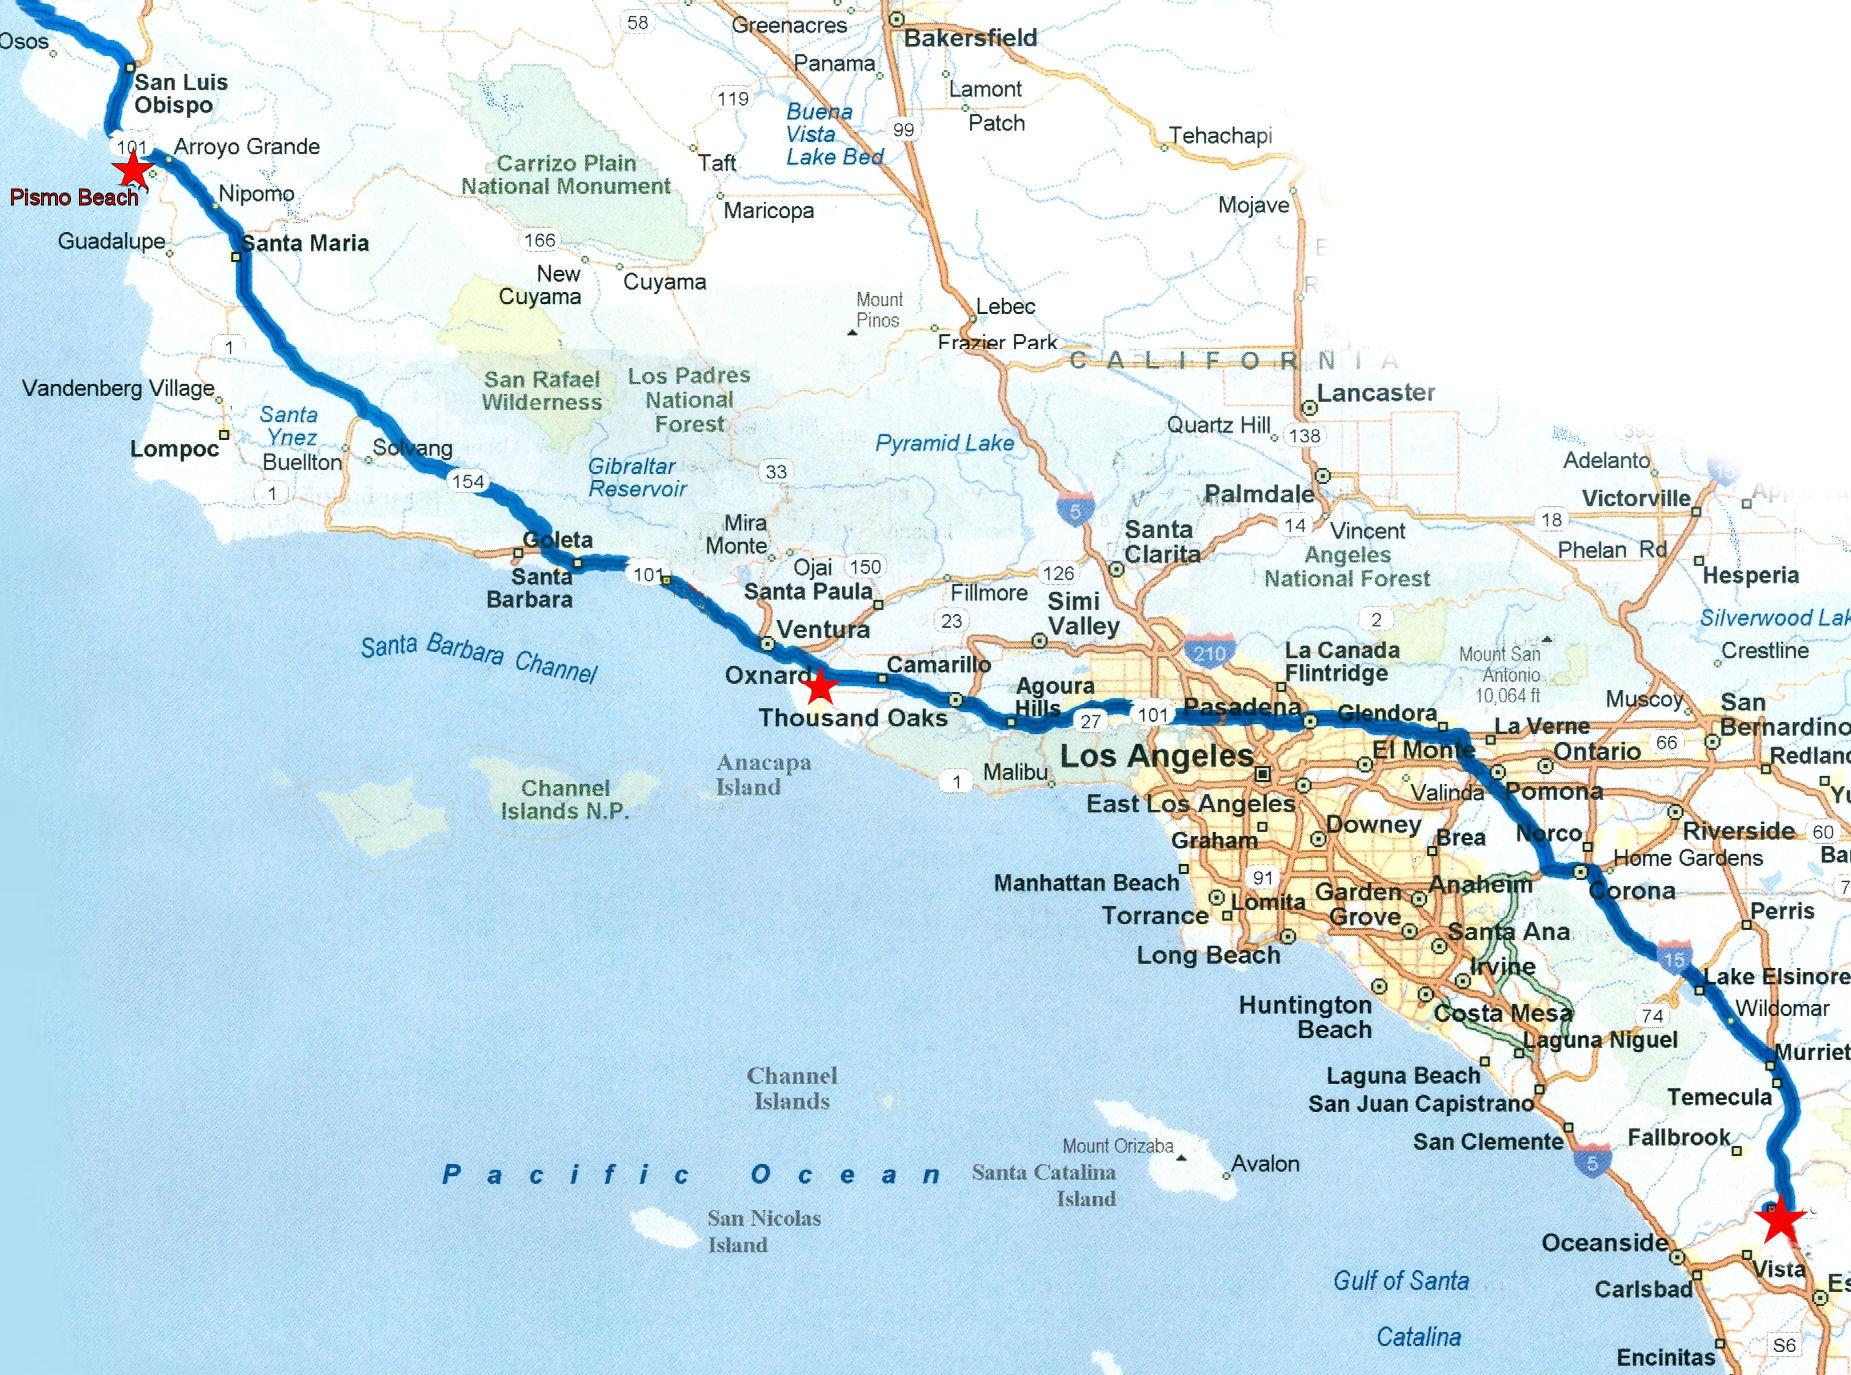 Pacific Coast Road Trip Htm Google Maps California California Coast - Detailed Map Of California Coastline